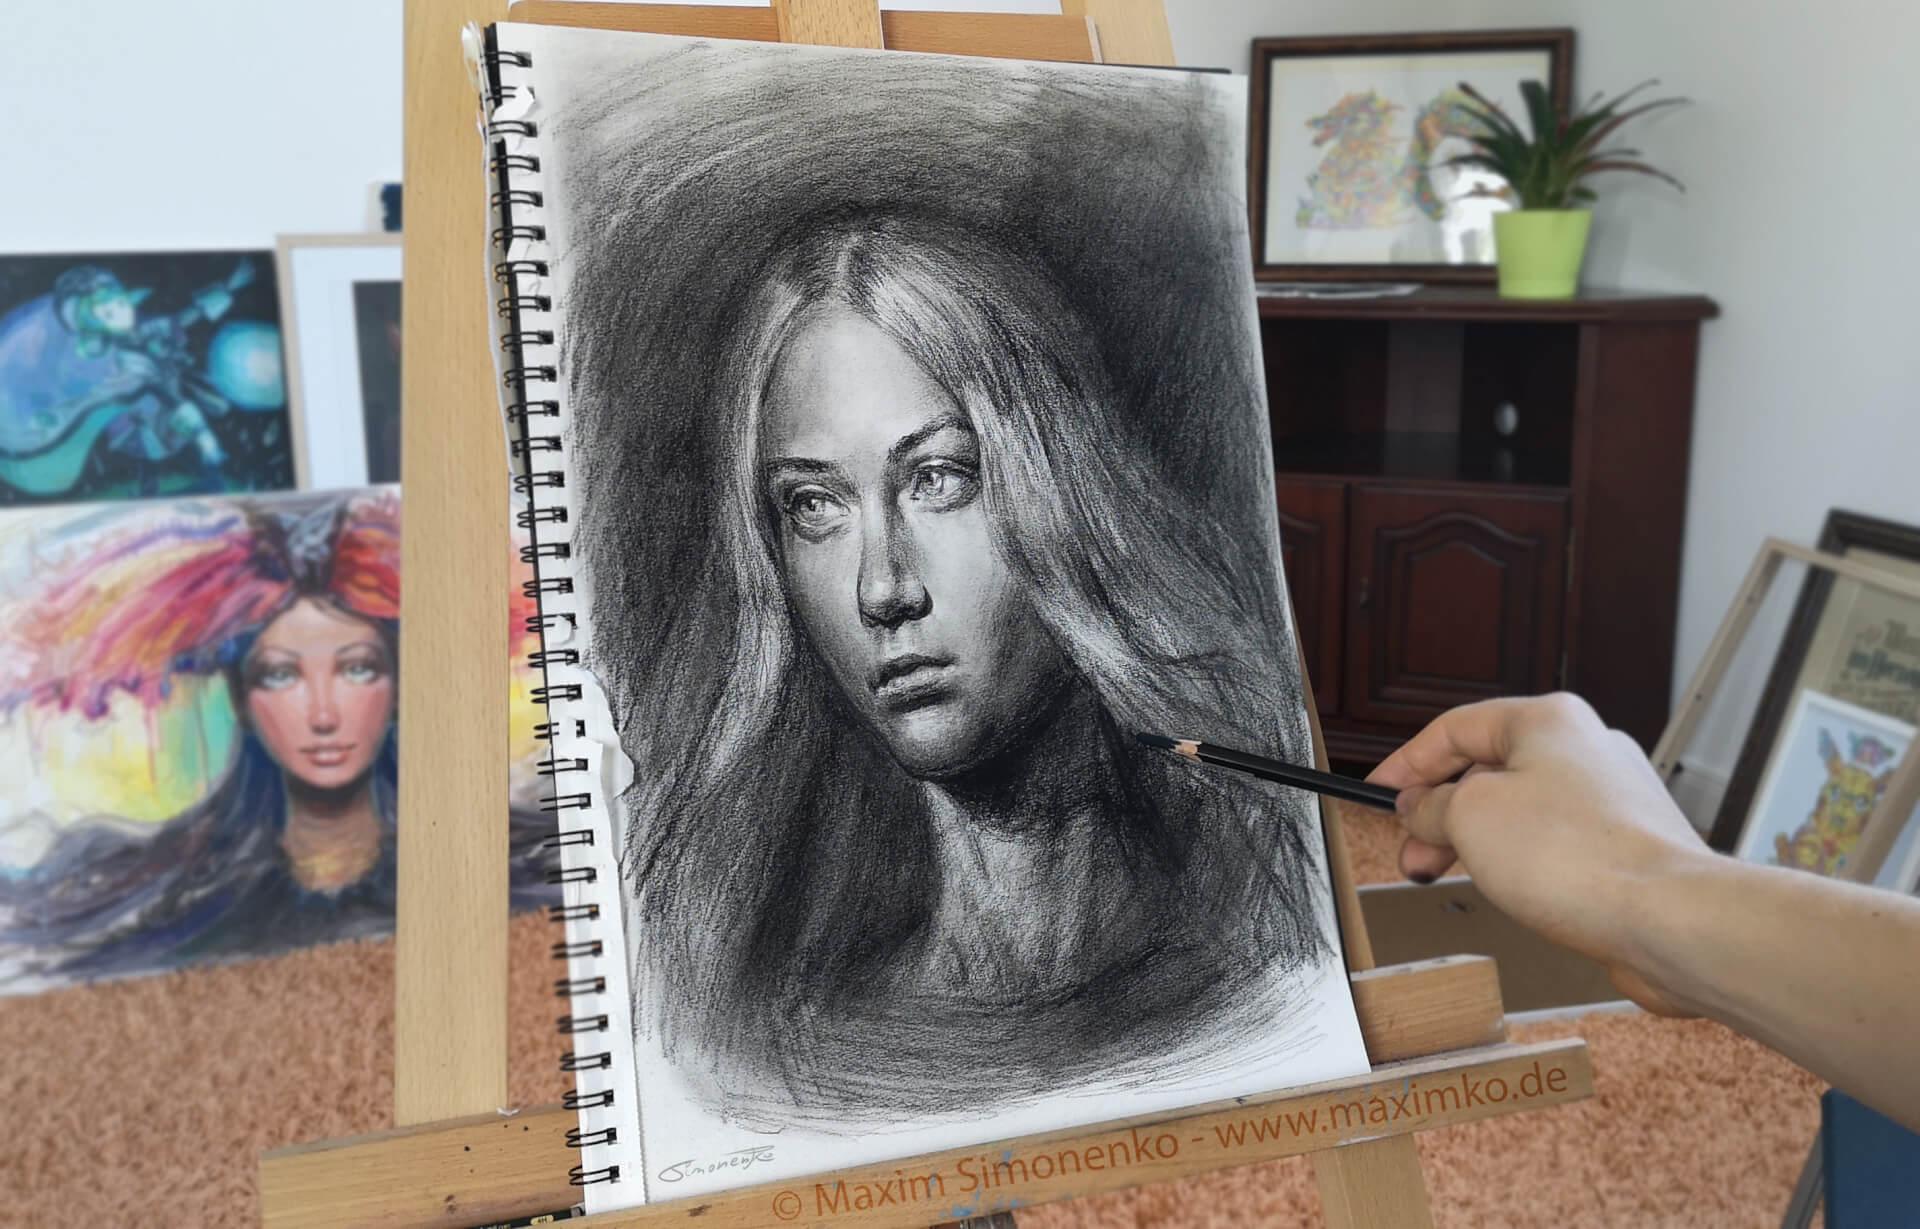 kohle portrait junge frau maxim simonenko